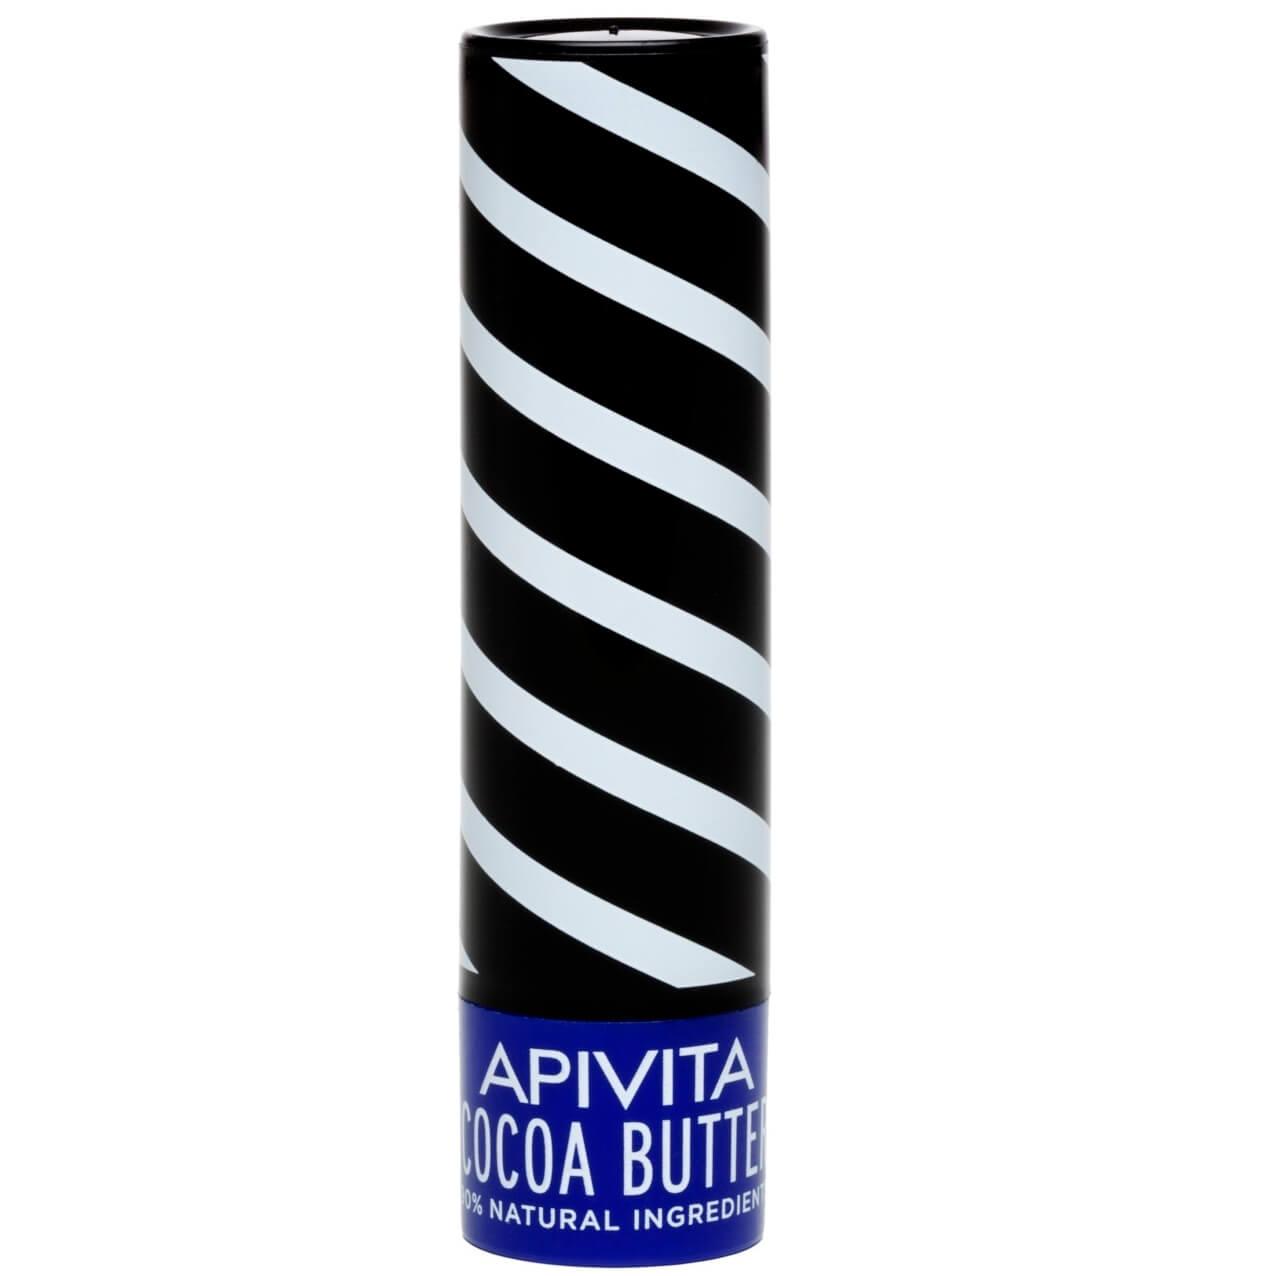 Apivita Lip Care Ενυδατικά Lip Balm Χειλιών 4.4g – Cocoa Butter